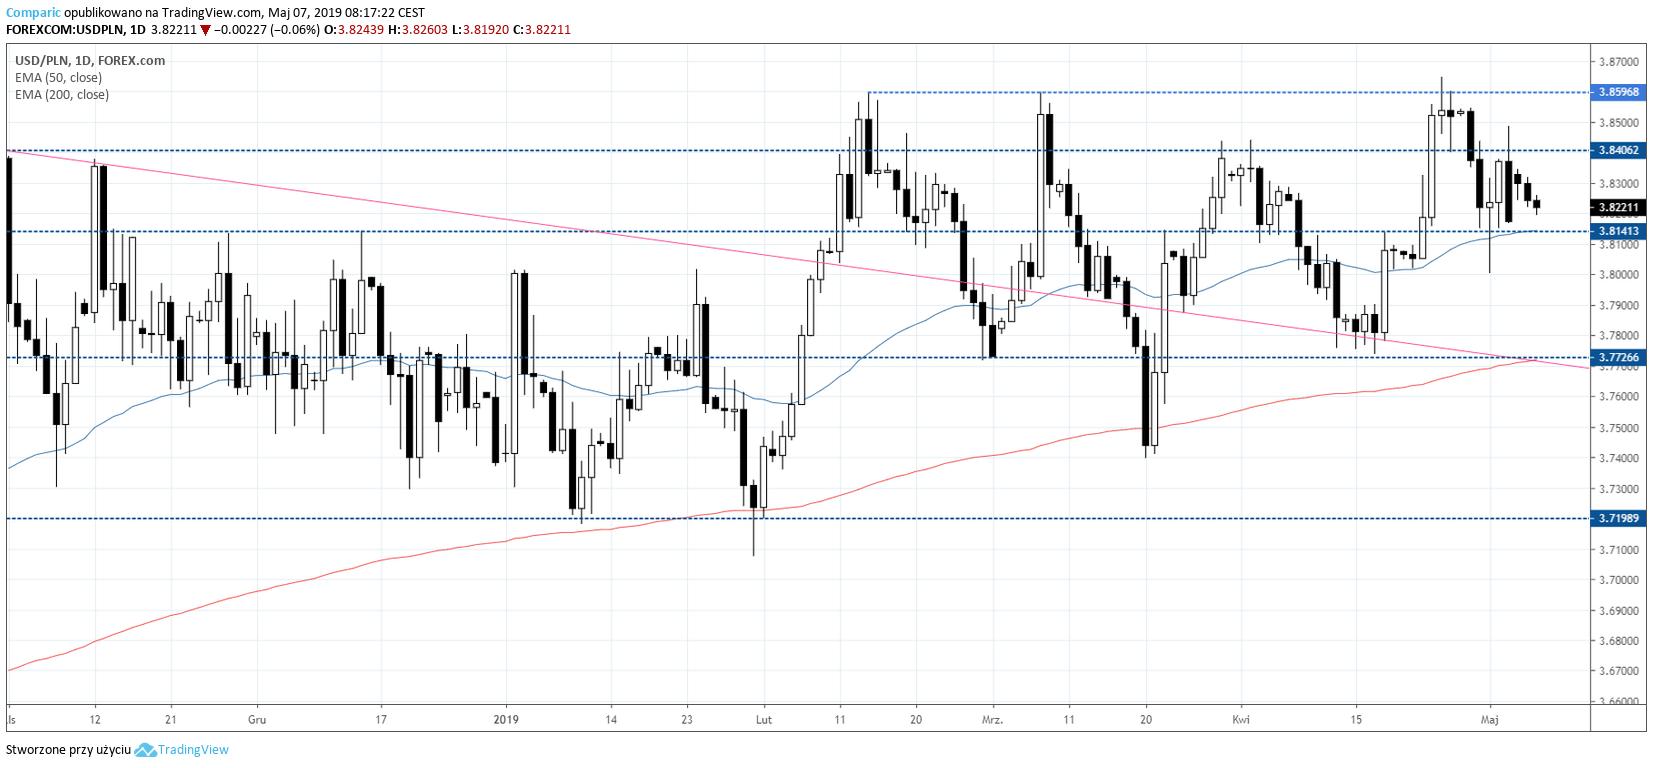 kurs dolara USDPLN 7 maja 2019